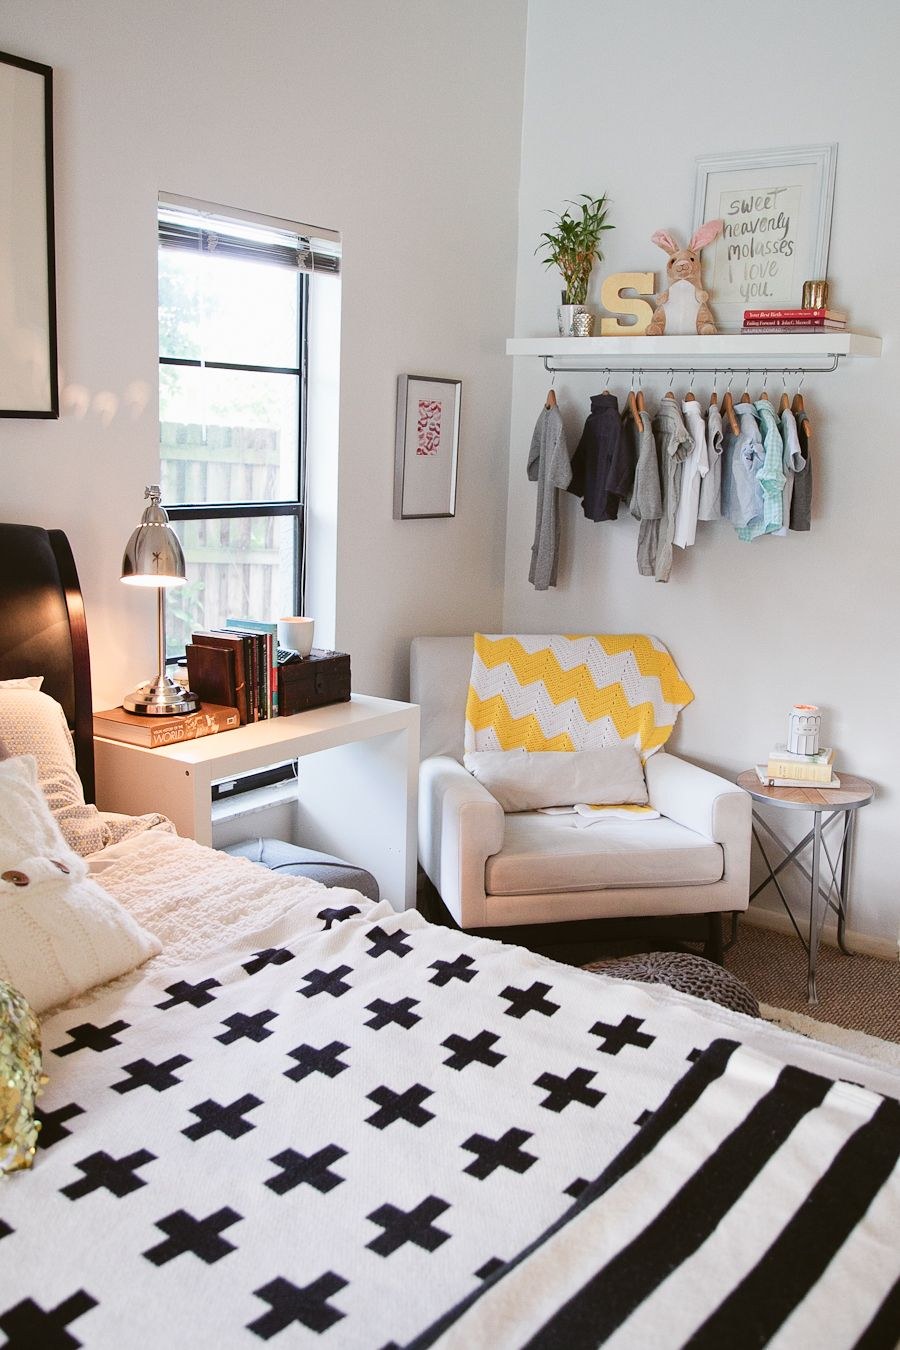 5 Tips for a Cozy(er) Bedroom | Diy bedroom decor, Bedroom ...